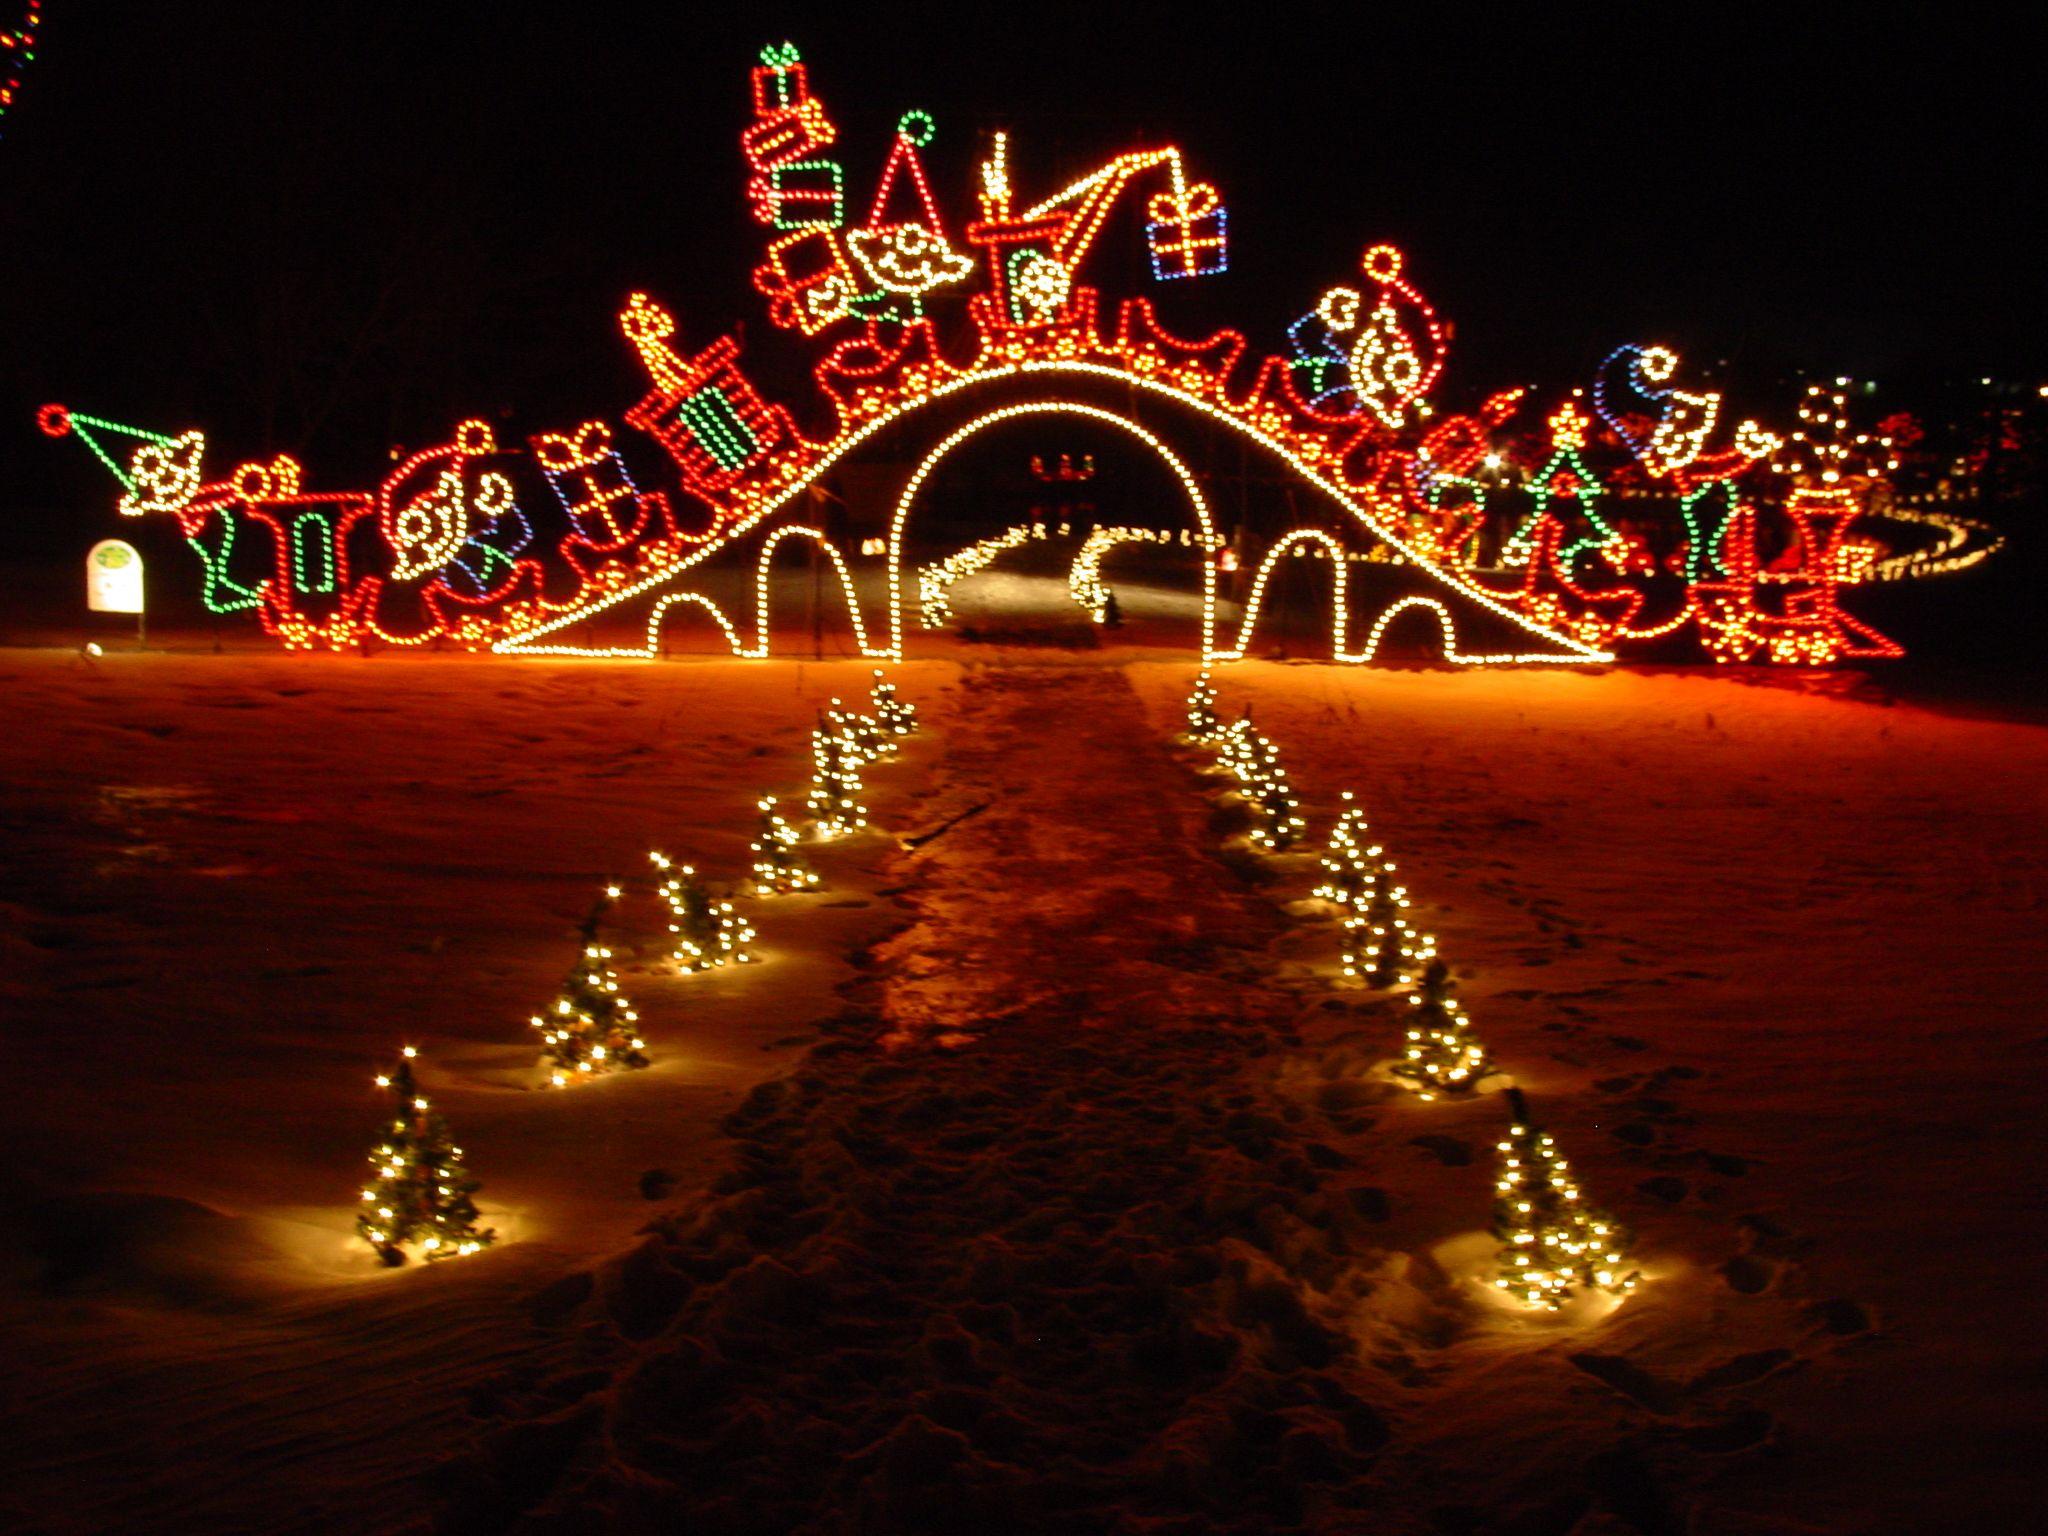 Yukon, Oklahoma - Christmas in the Park | CHRISTMAS in 2018 ...